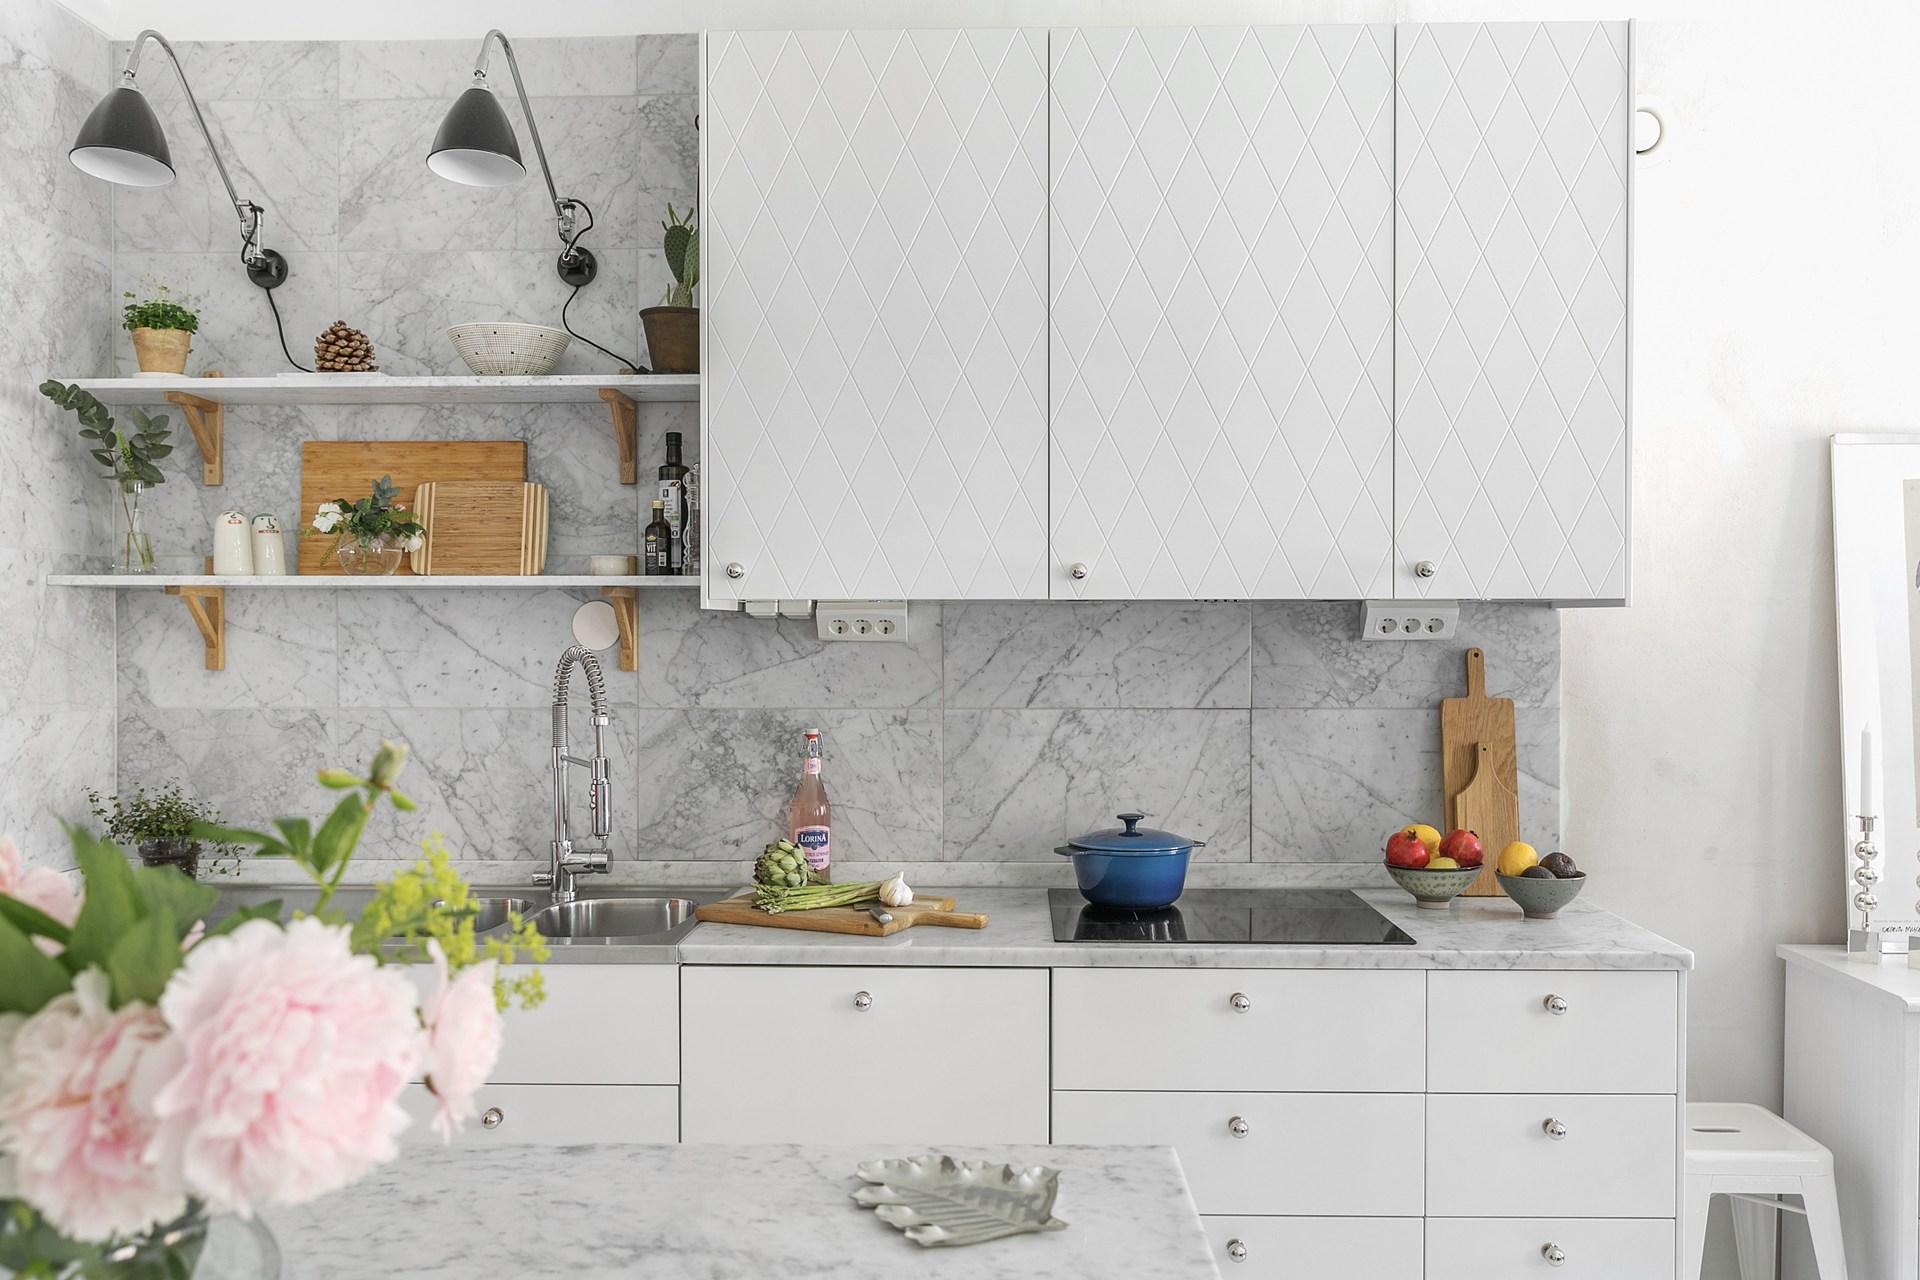 кухня столешница фартук мрамор плита встроенная вытяжка мойка кран полки